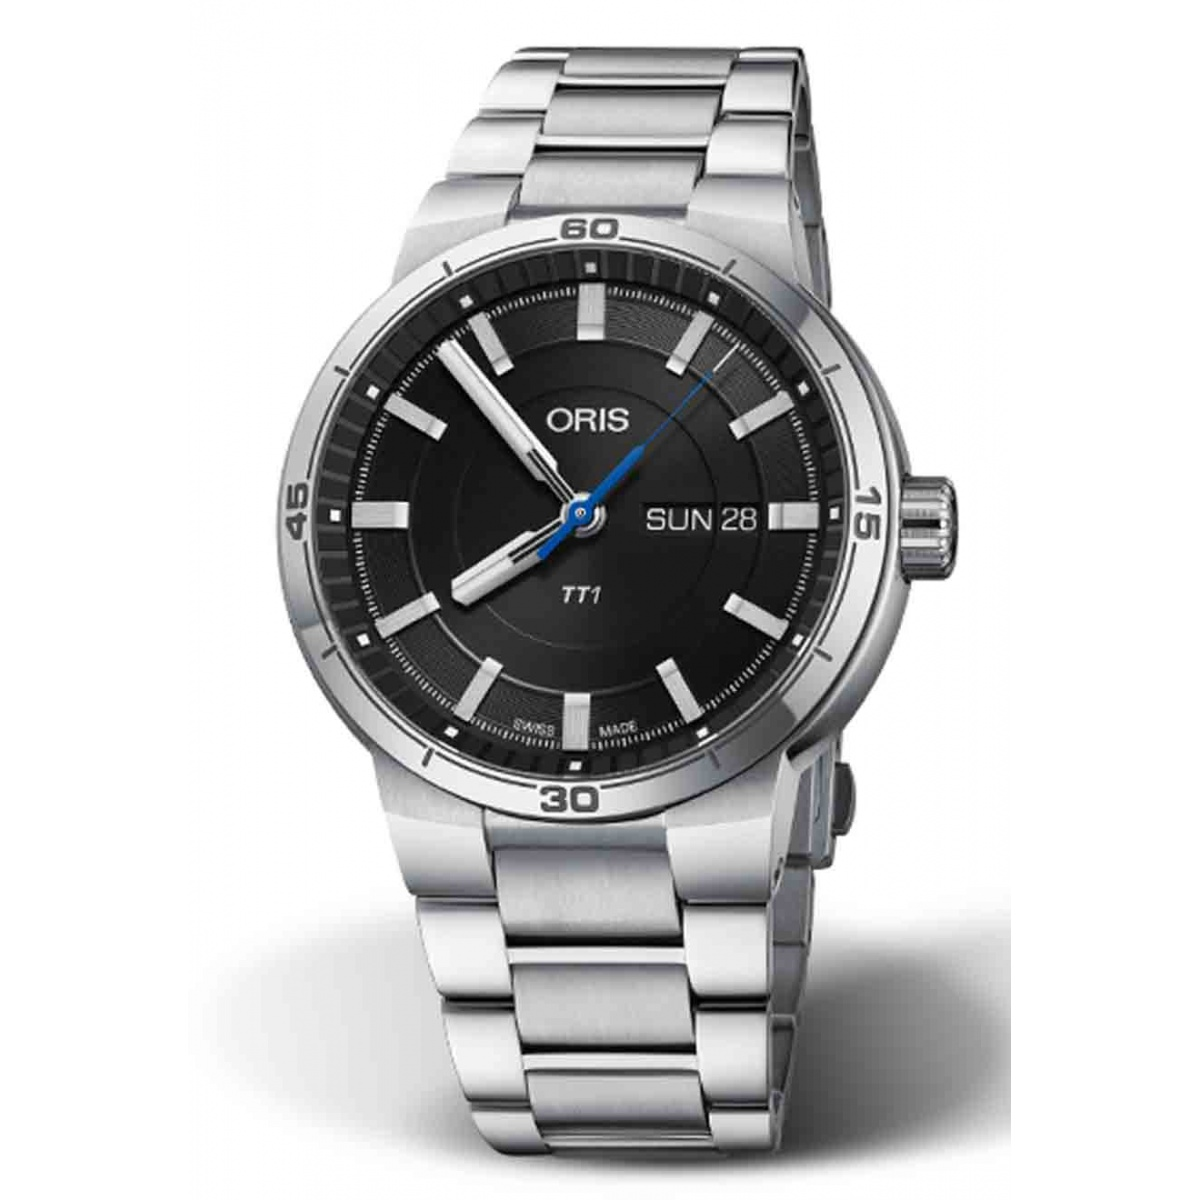 ORIS TT1 DAY DATE 100 M ∅42 mm, Esfera negra, brazalete de acero